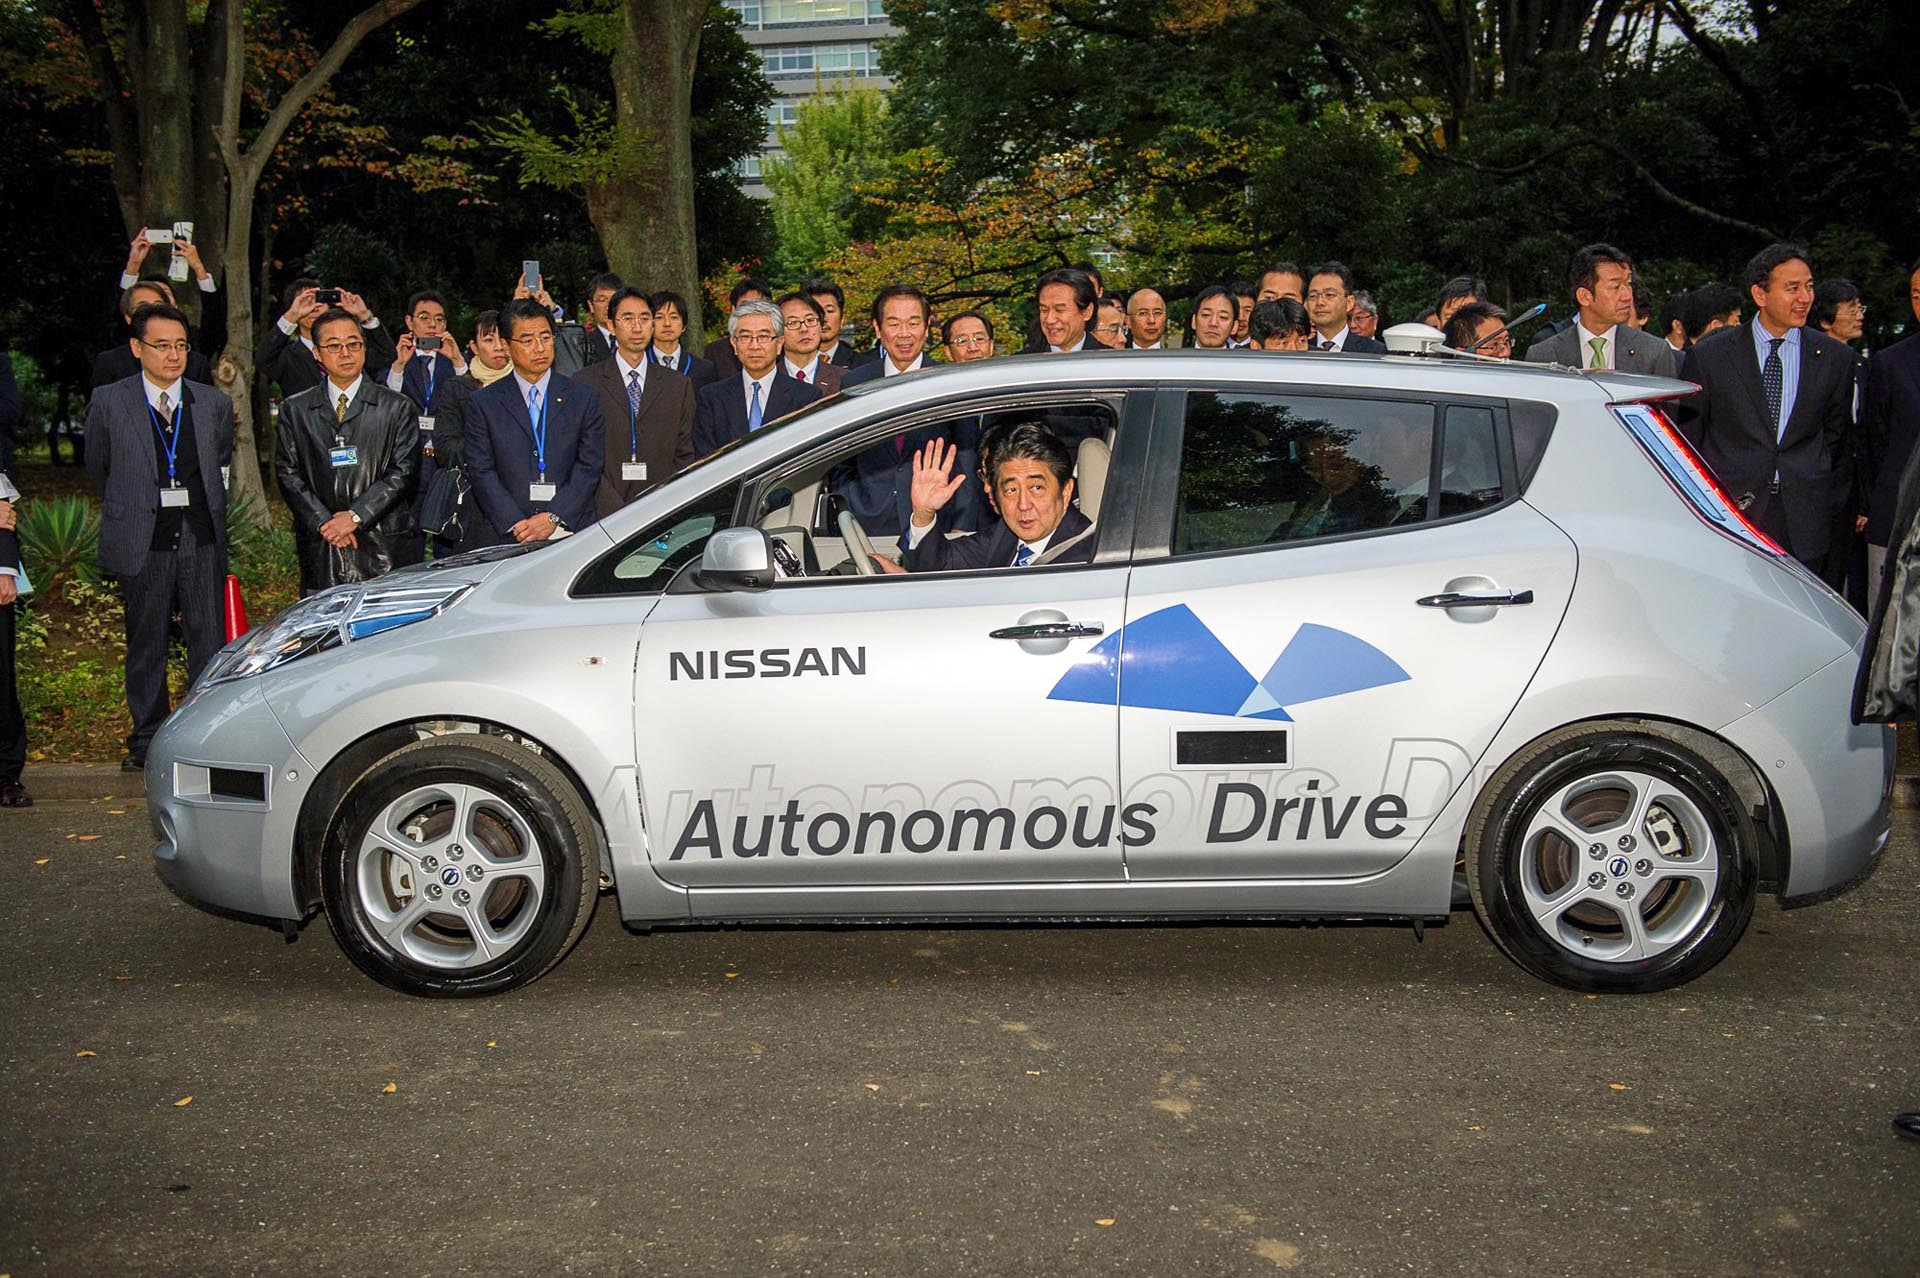 Auto Tech: Autonomous Cars Will Change Everything - Autos ca